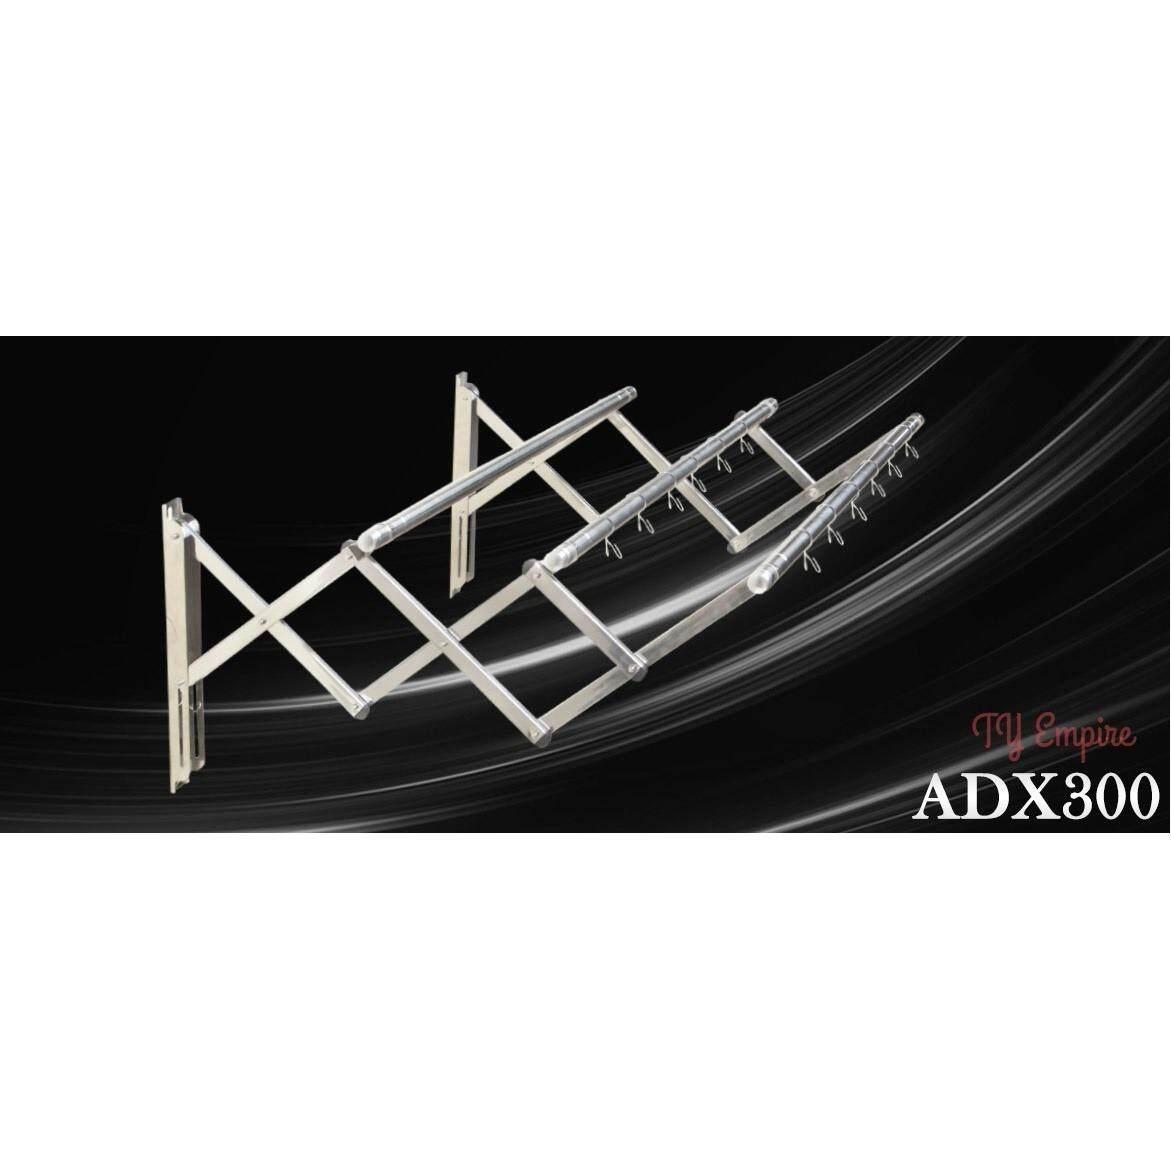 ADX 300 Retractable Premium Stainless Steel Clothes Hanger